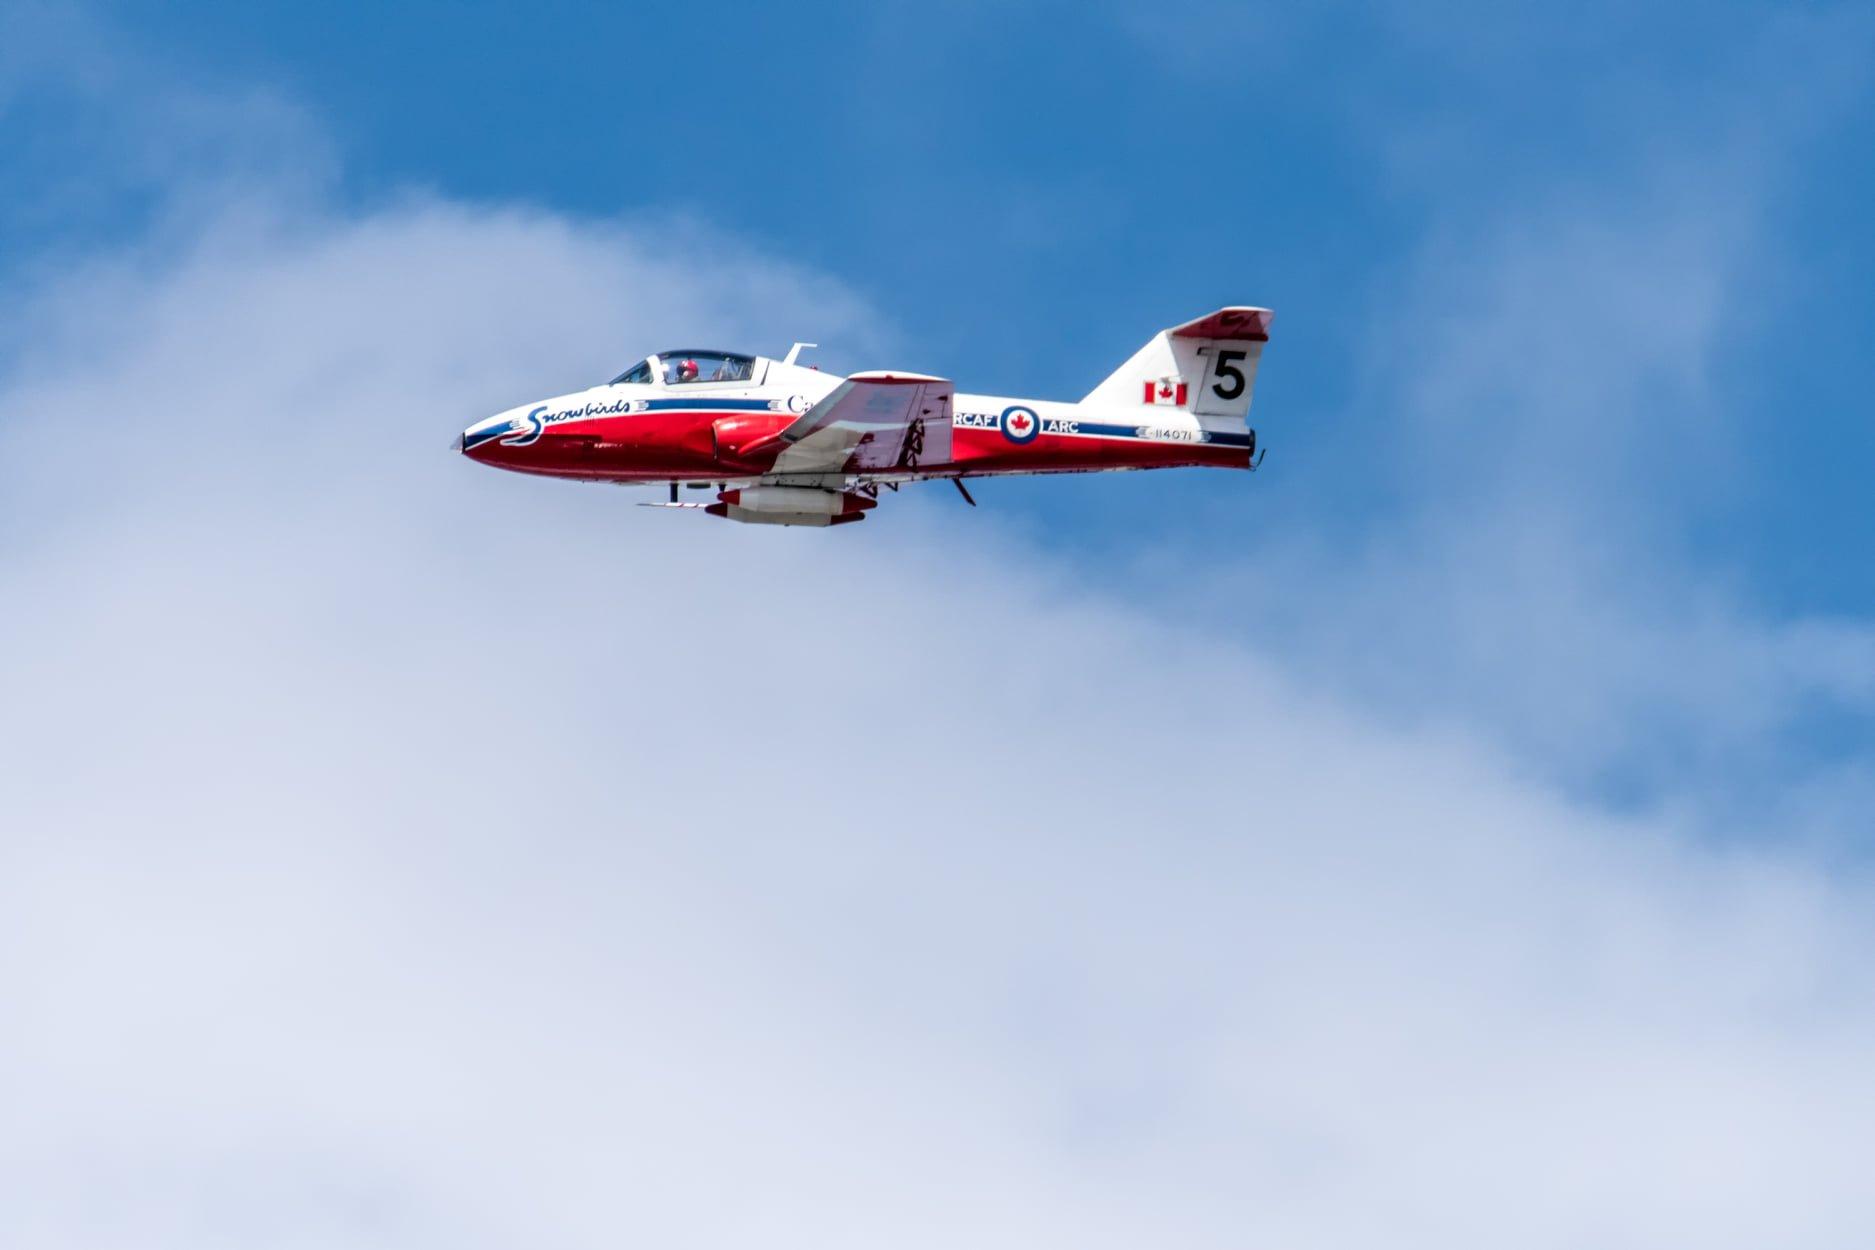 5_Snowbird-Jet